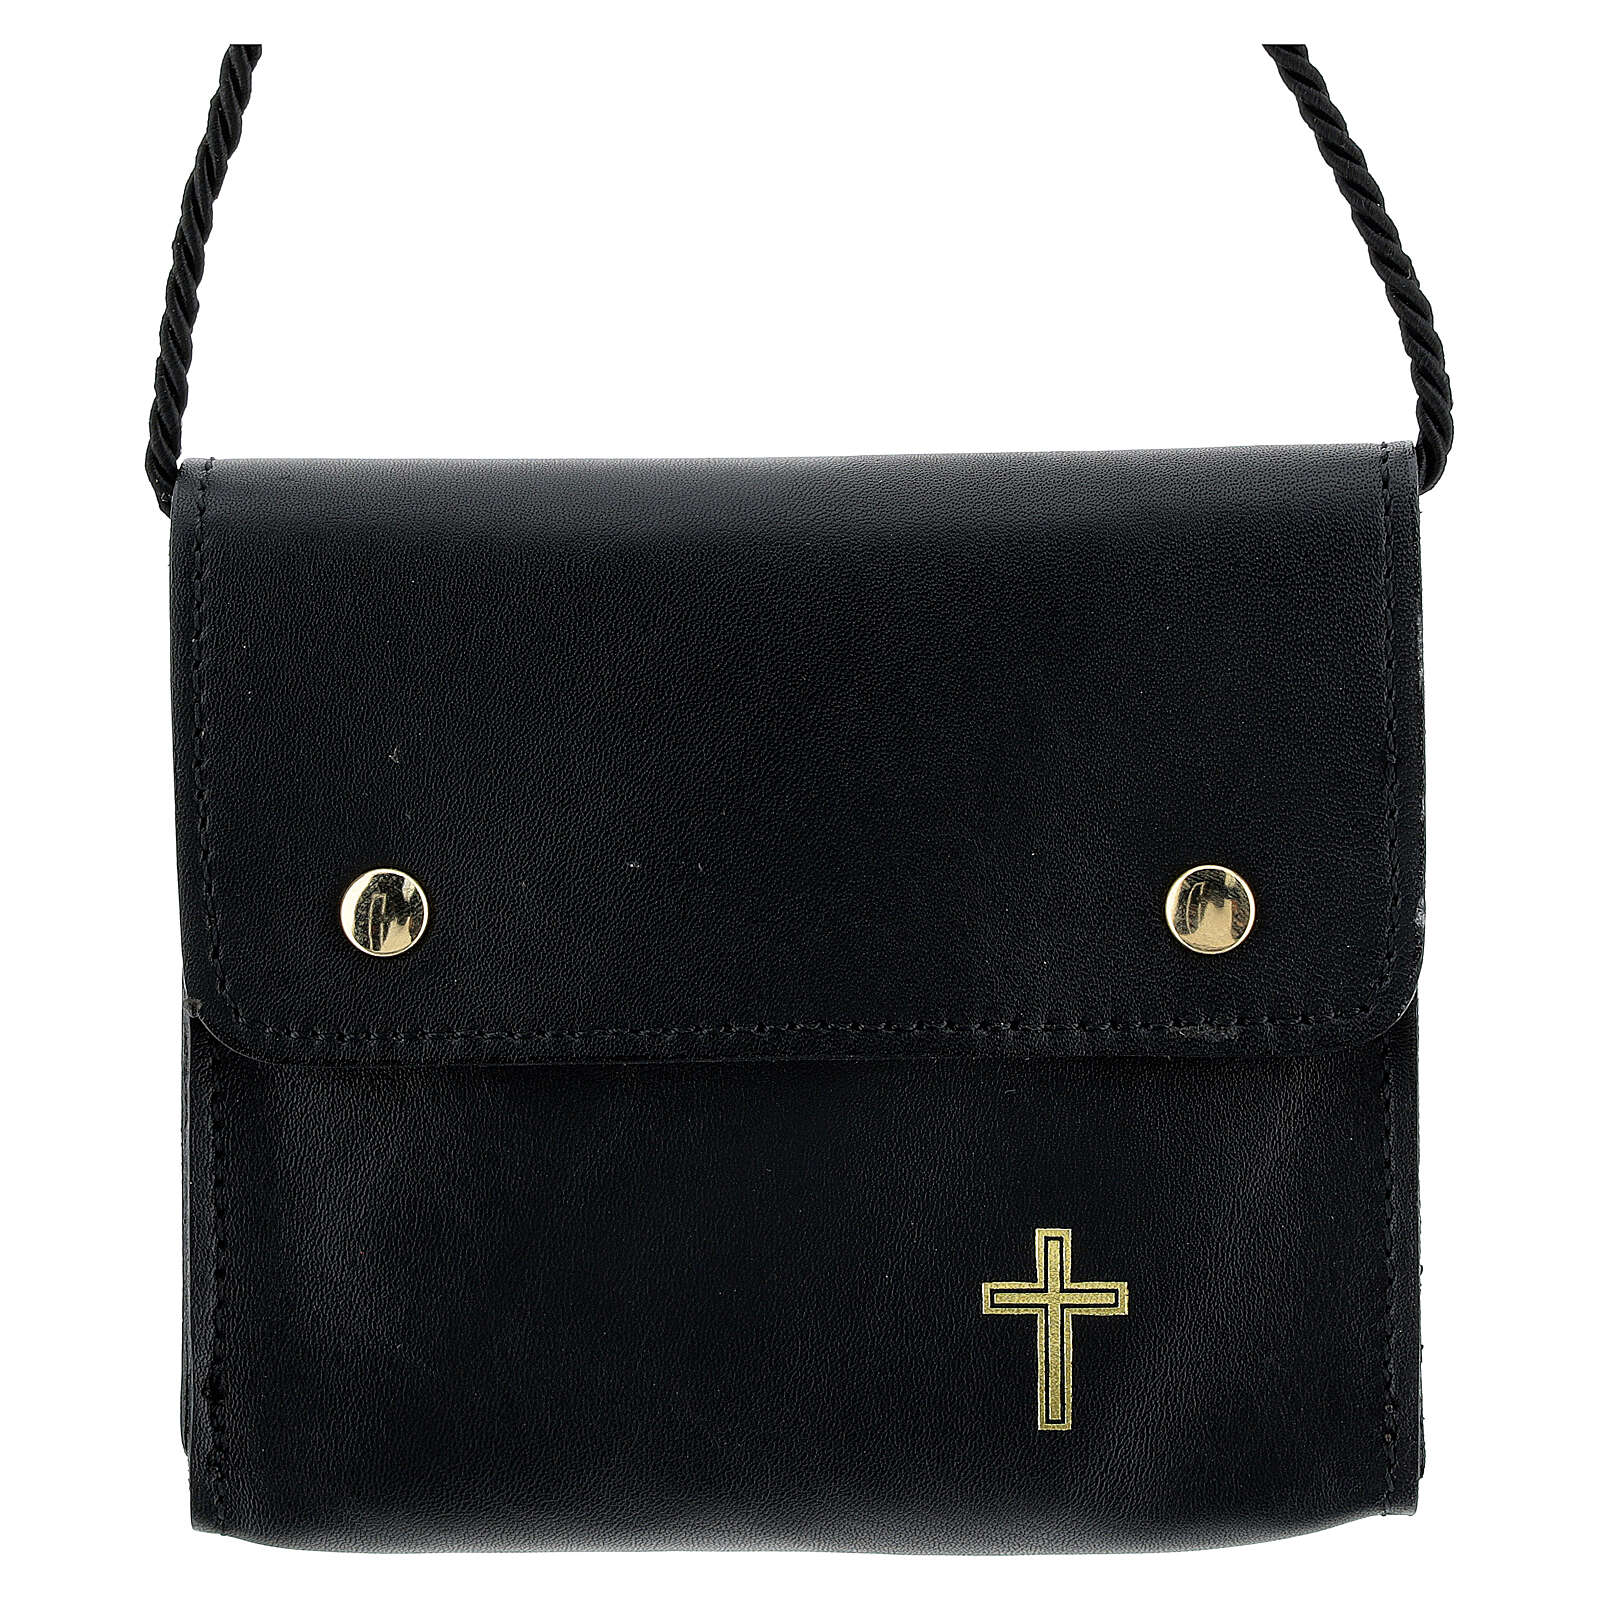 Paten burse 4x5 in real black leather 4